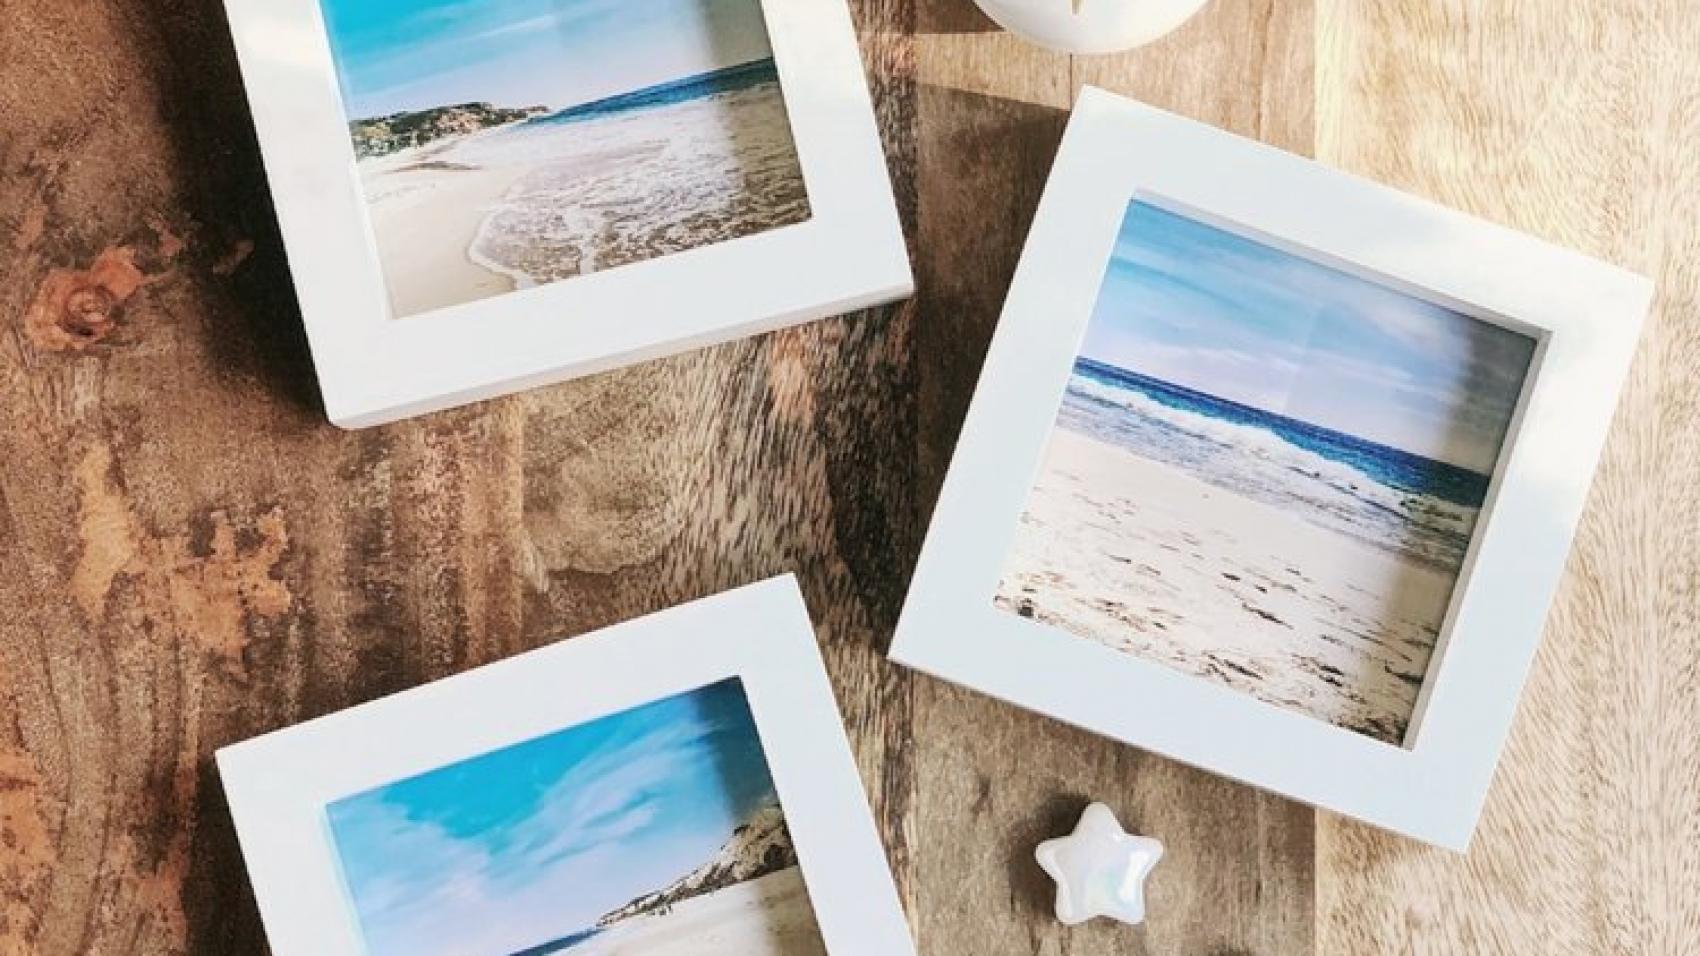 DIY Pictures in Frames